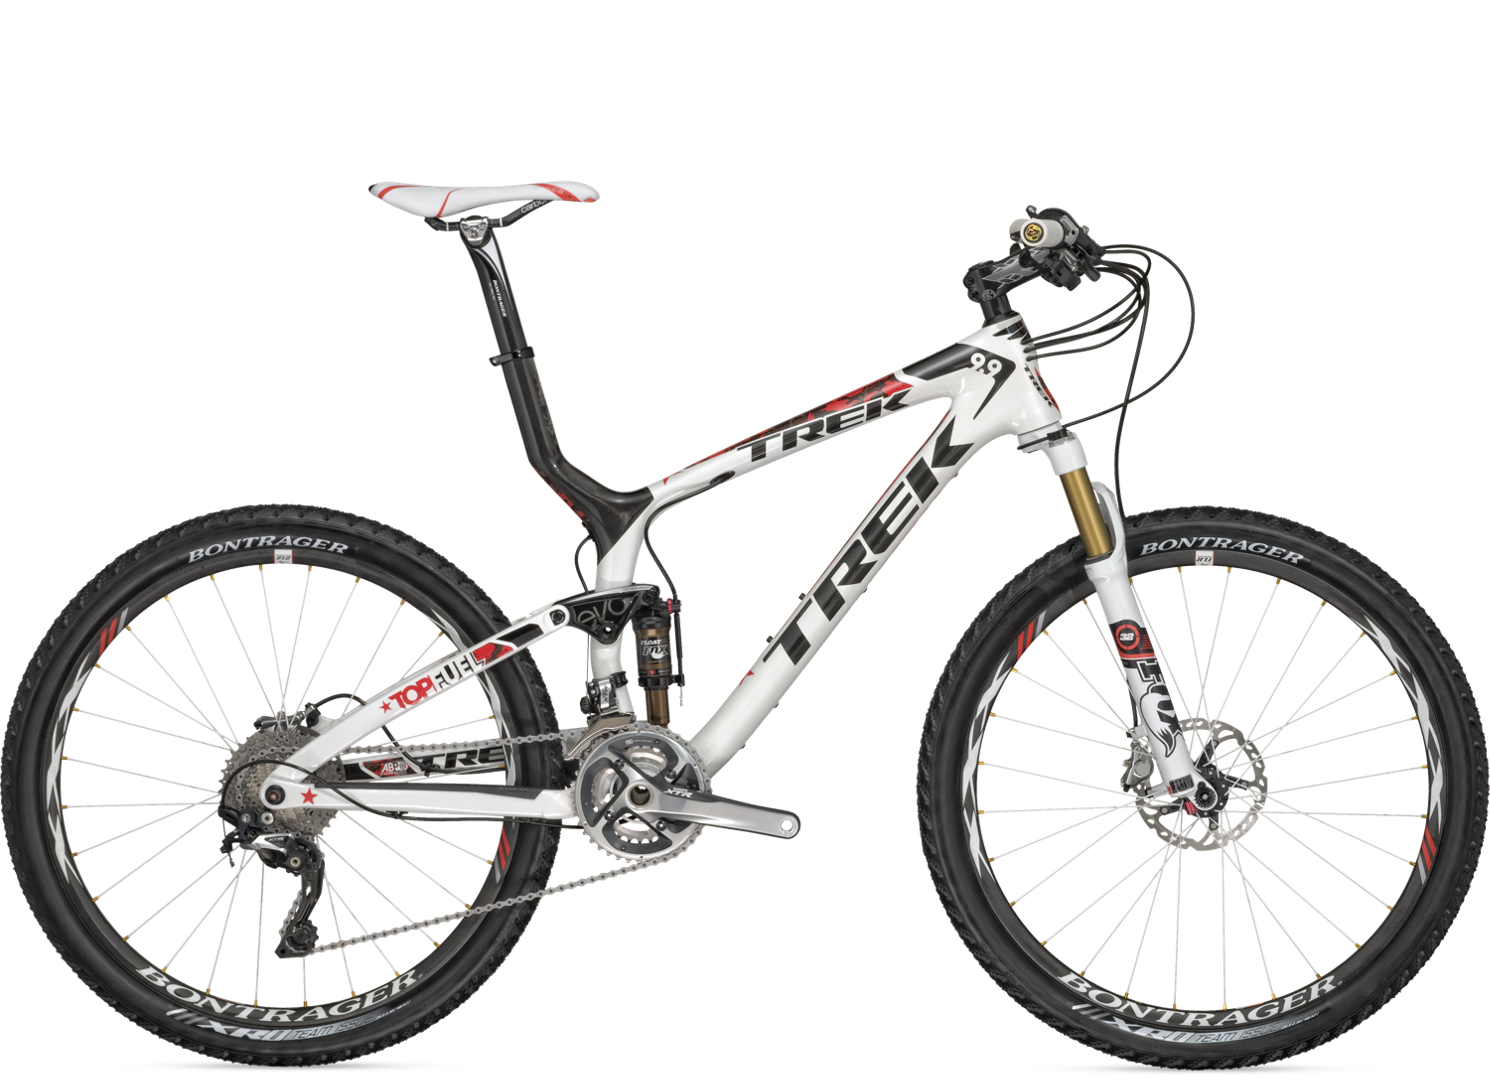 Bicycle Tune Up >> 2012 Top Fuel 9.9 SSL - Bike Archive - Trek Bicycle